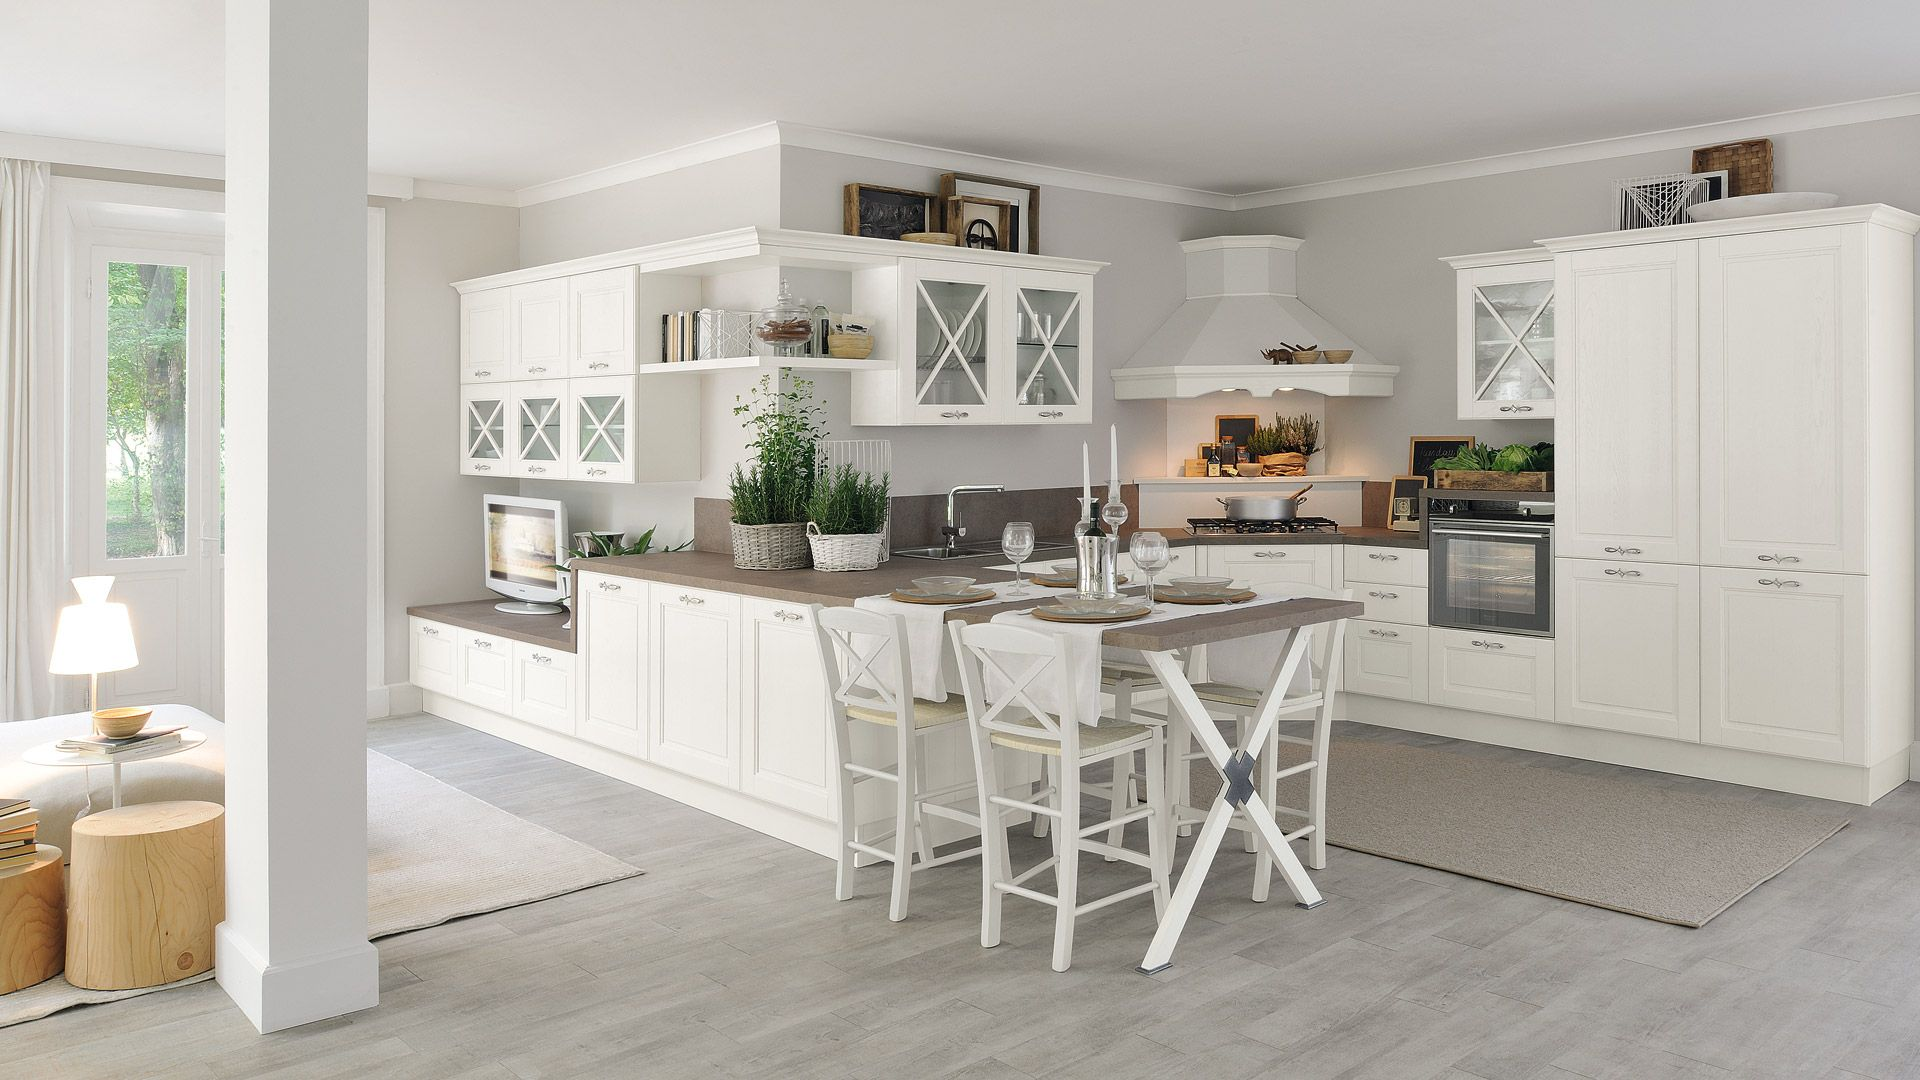 Agnese - Cucine Classiche - Cucine Lube | Cucine | Pinterest | Kitchens